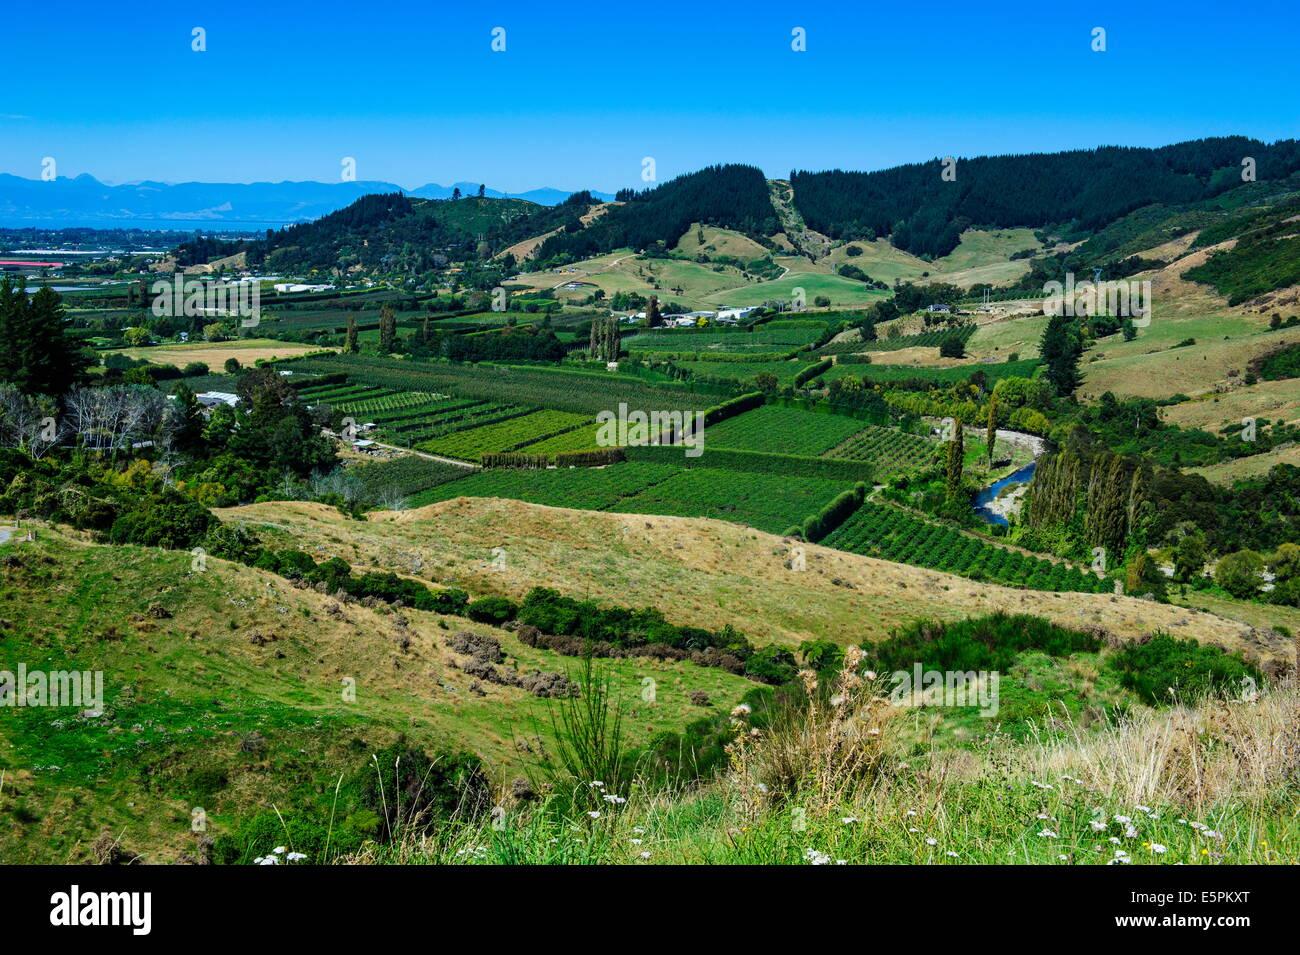 Blick über das grüne Tal des Kahurangi-Nationalpark, Südinsel, Neuseeland, Pazifik Stockbild